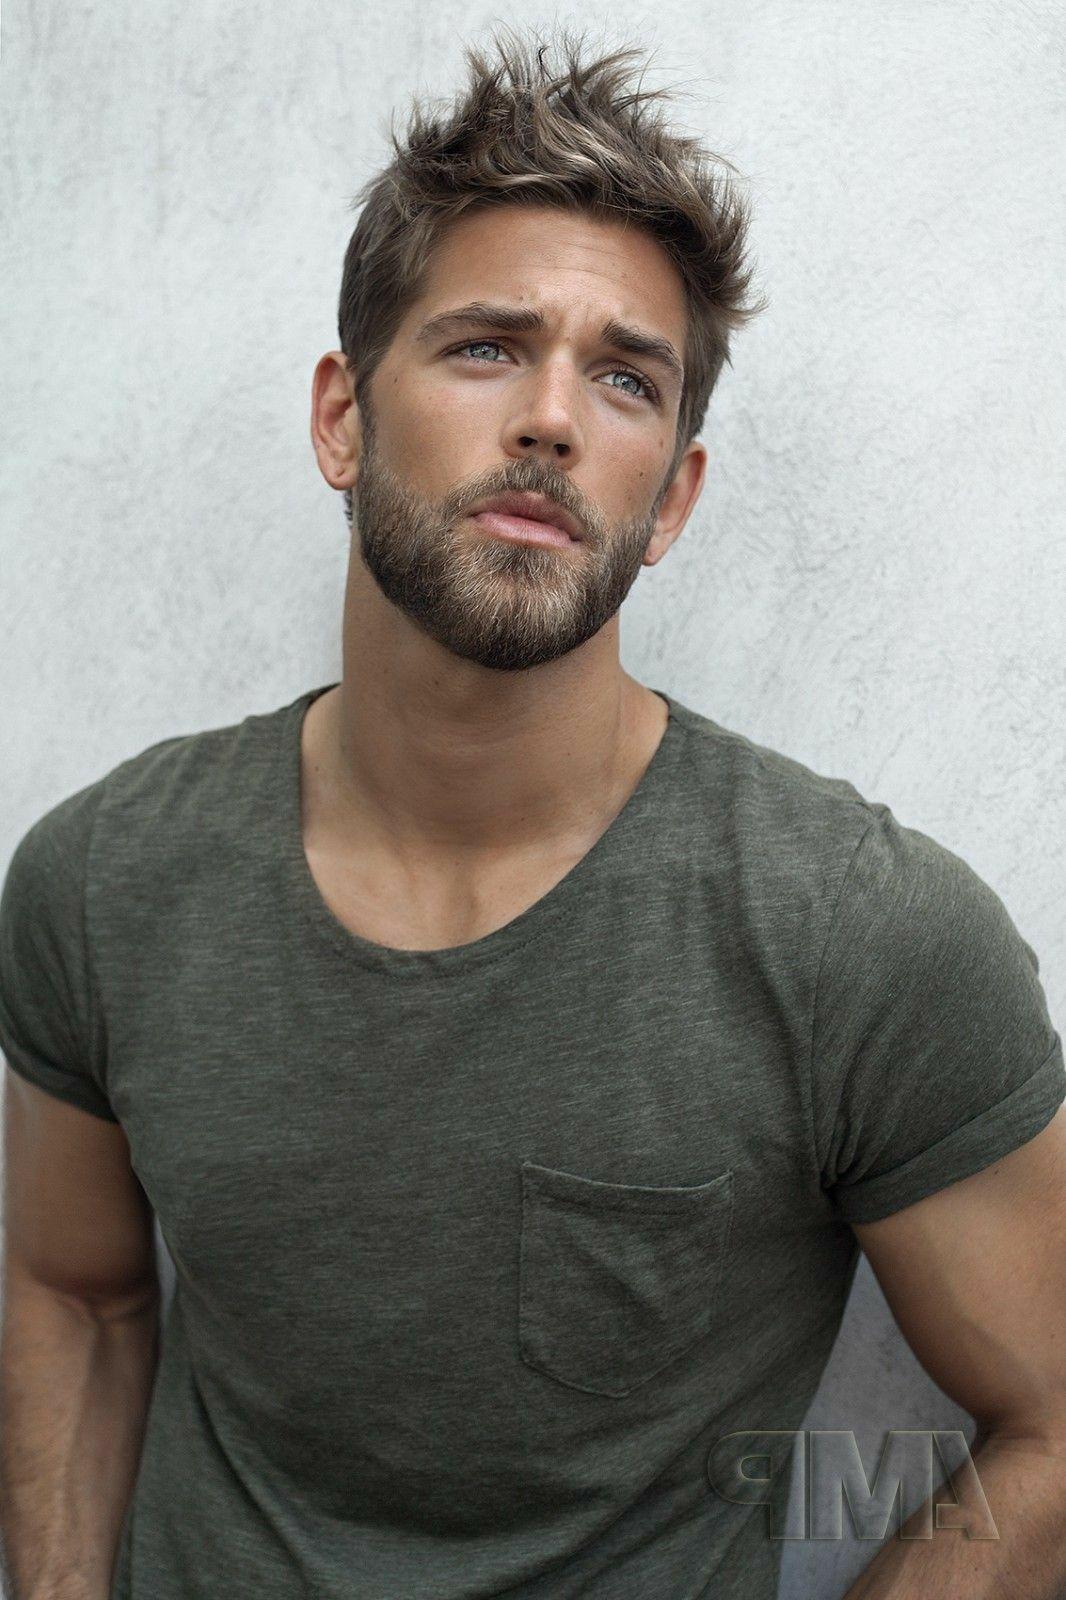 pinjesus ortega on handsome mature men | pinterest | hot guys